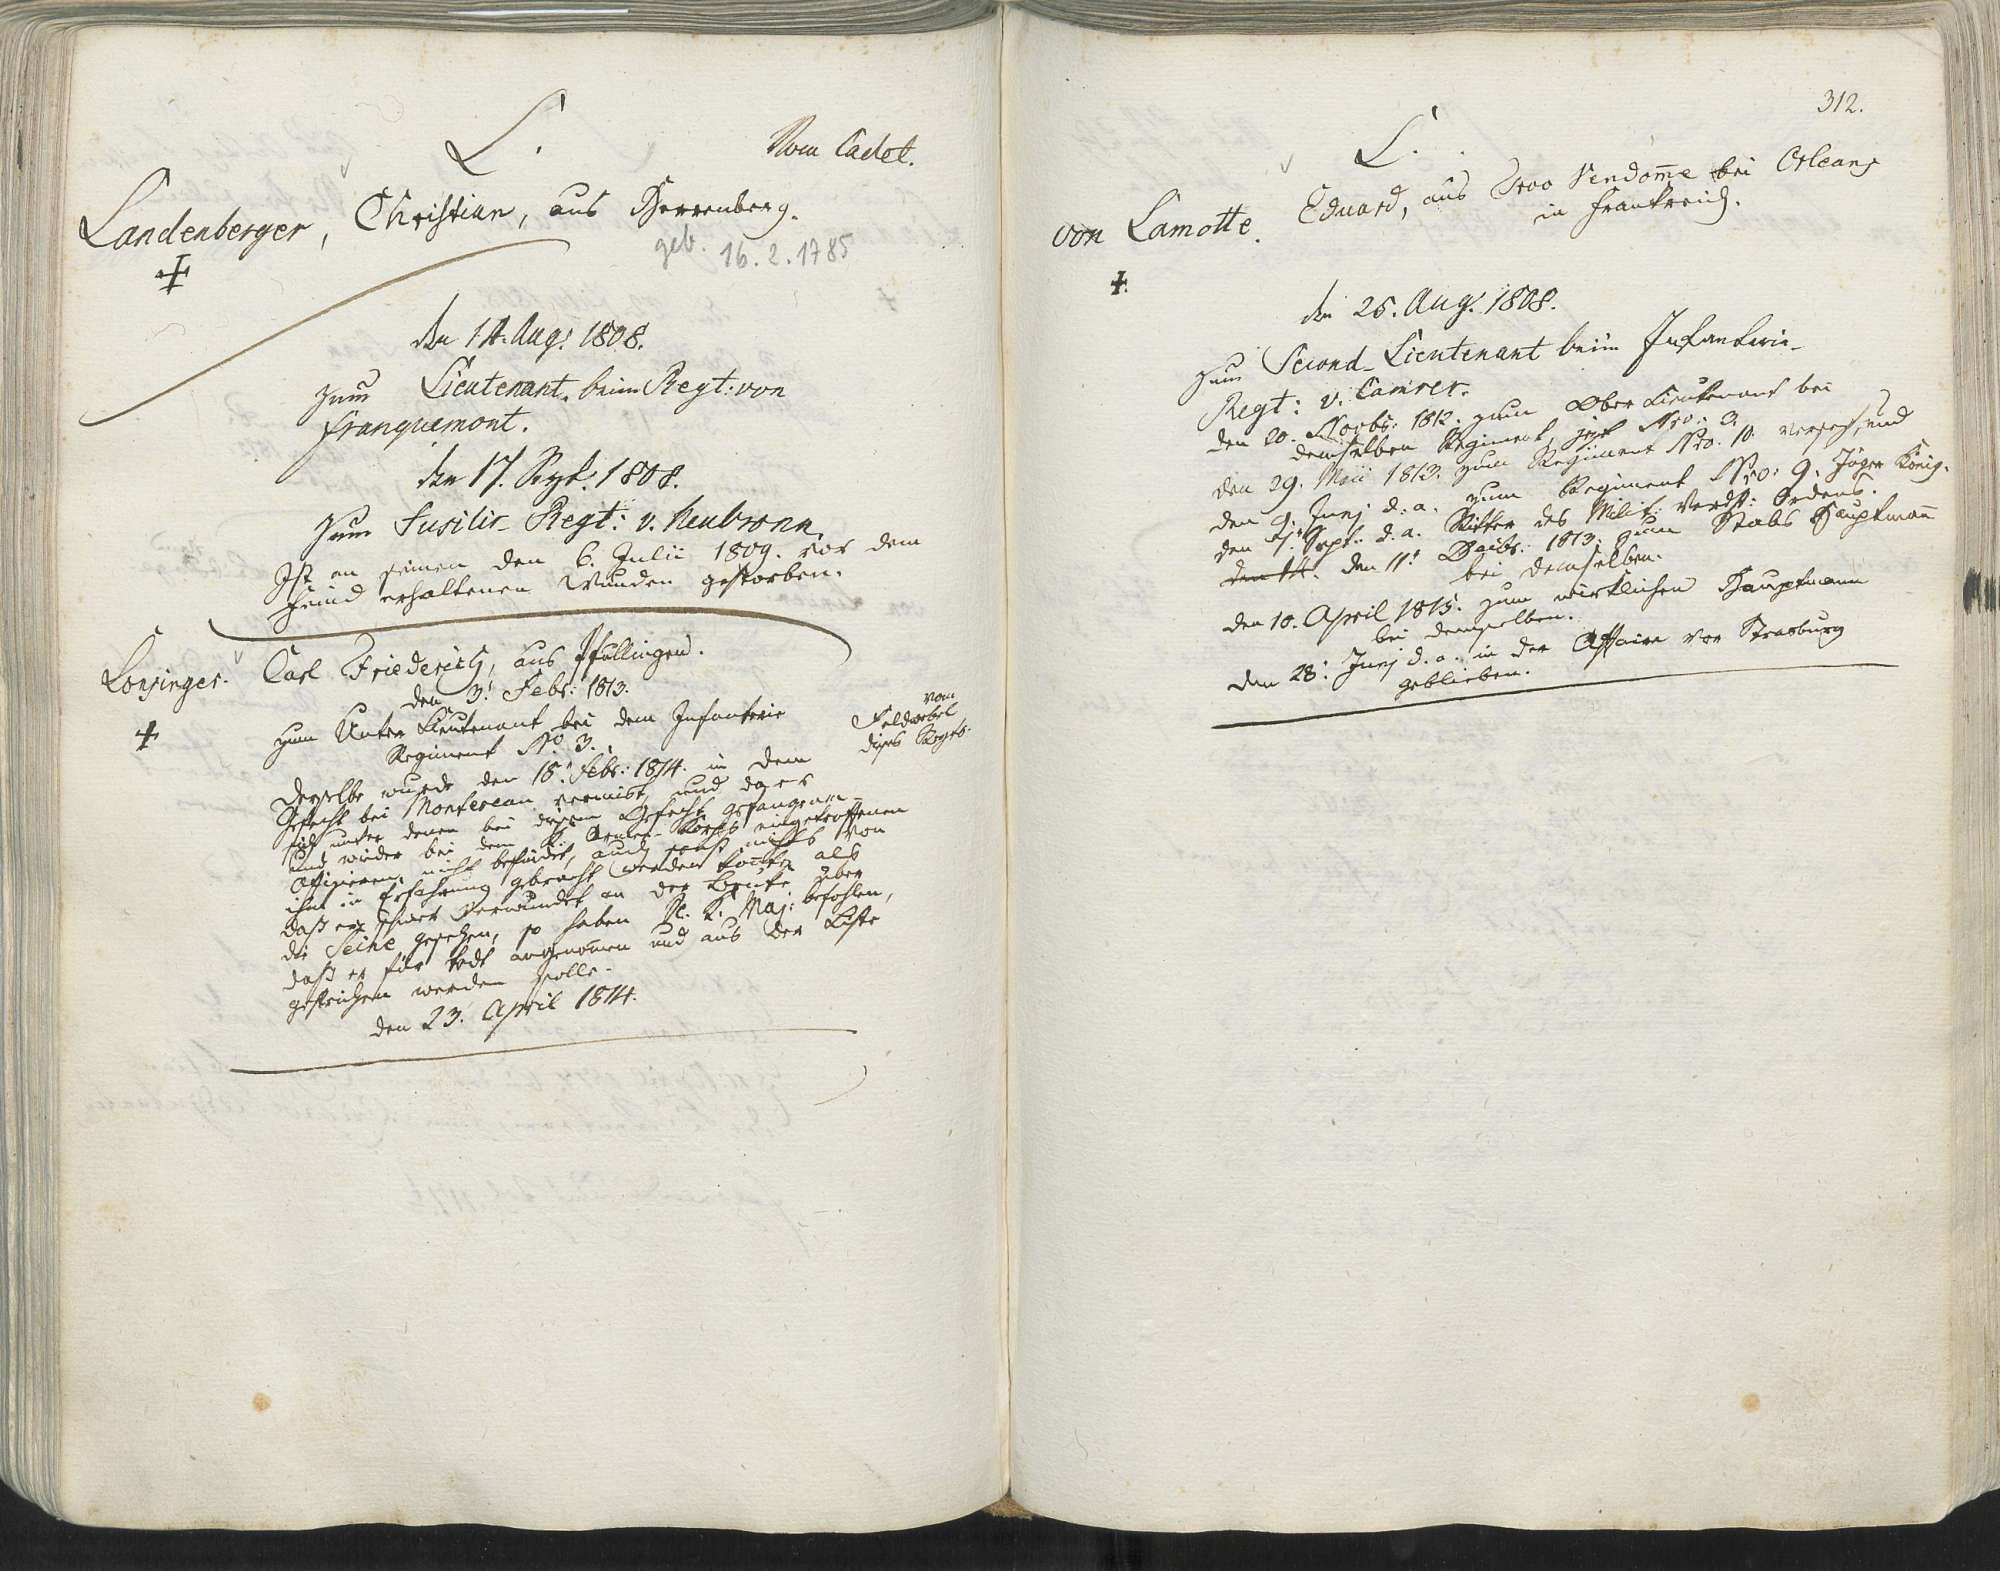 Lonsinger, Carl Friedrich, Bild 1